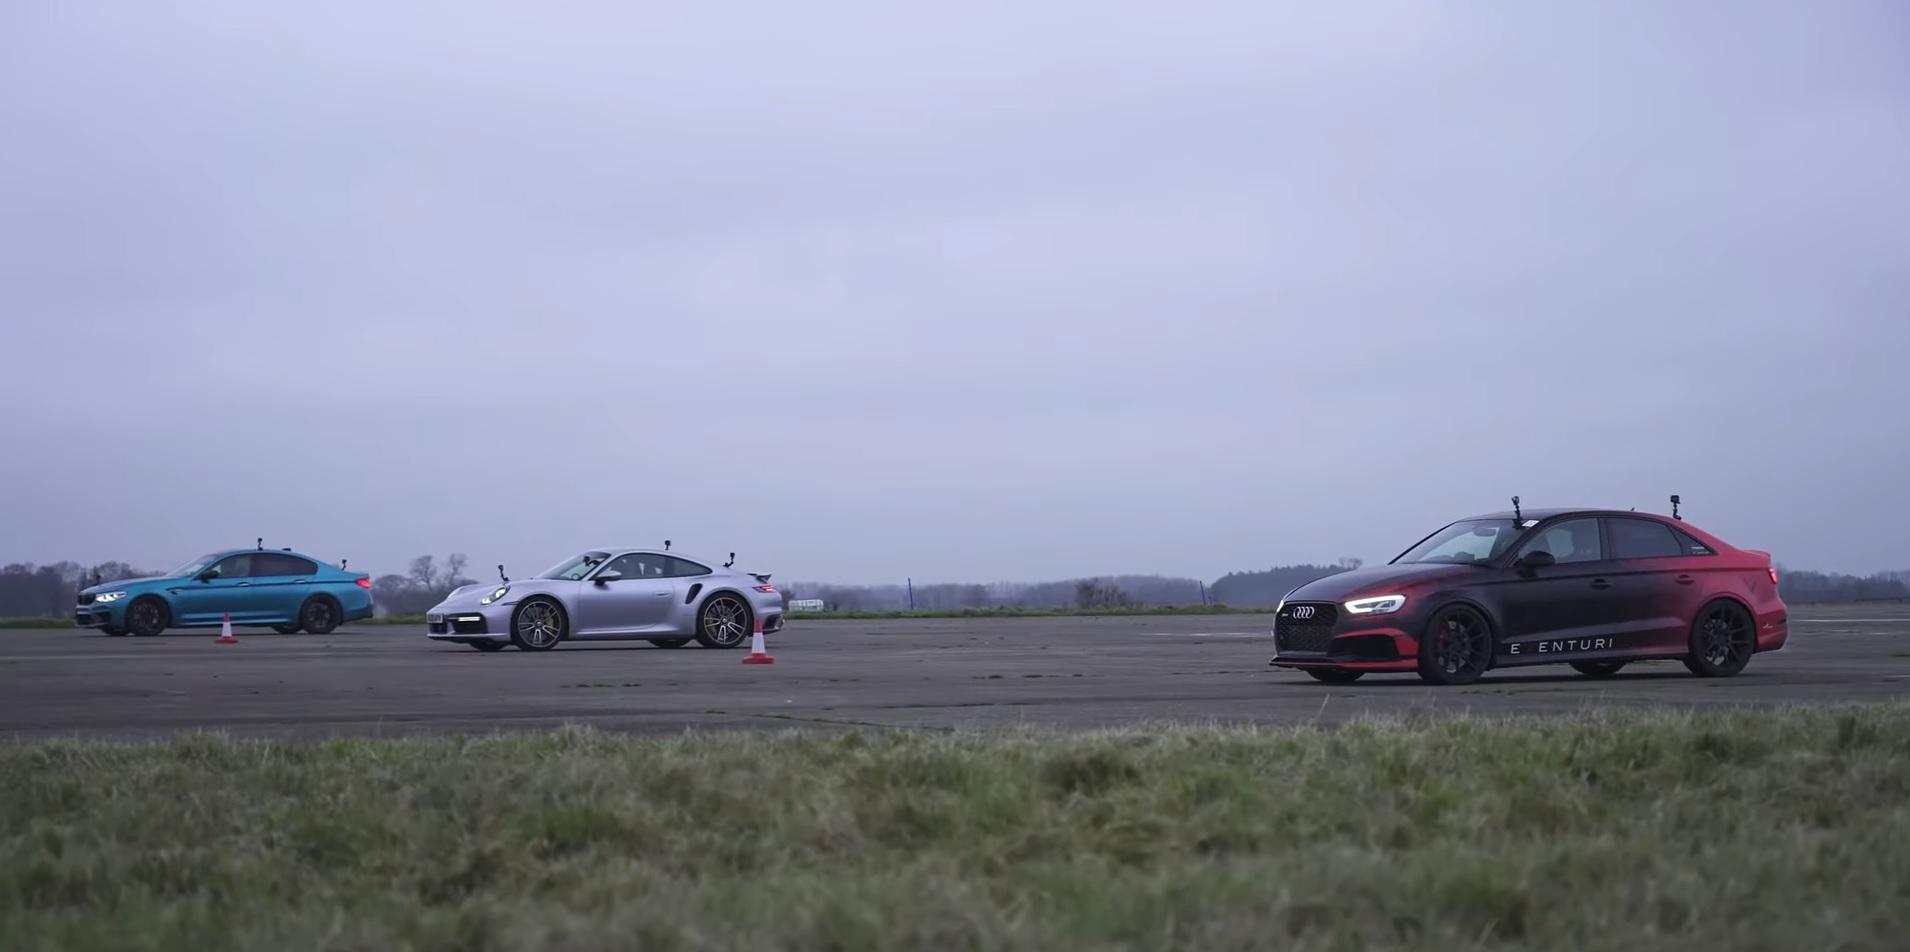 Porsche 911 Turbo S vs BMW M5 1000 HP vs Audi RS3 800 HP